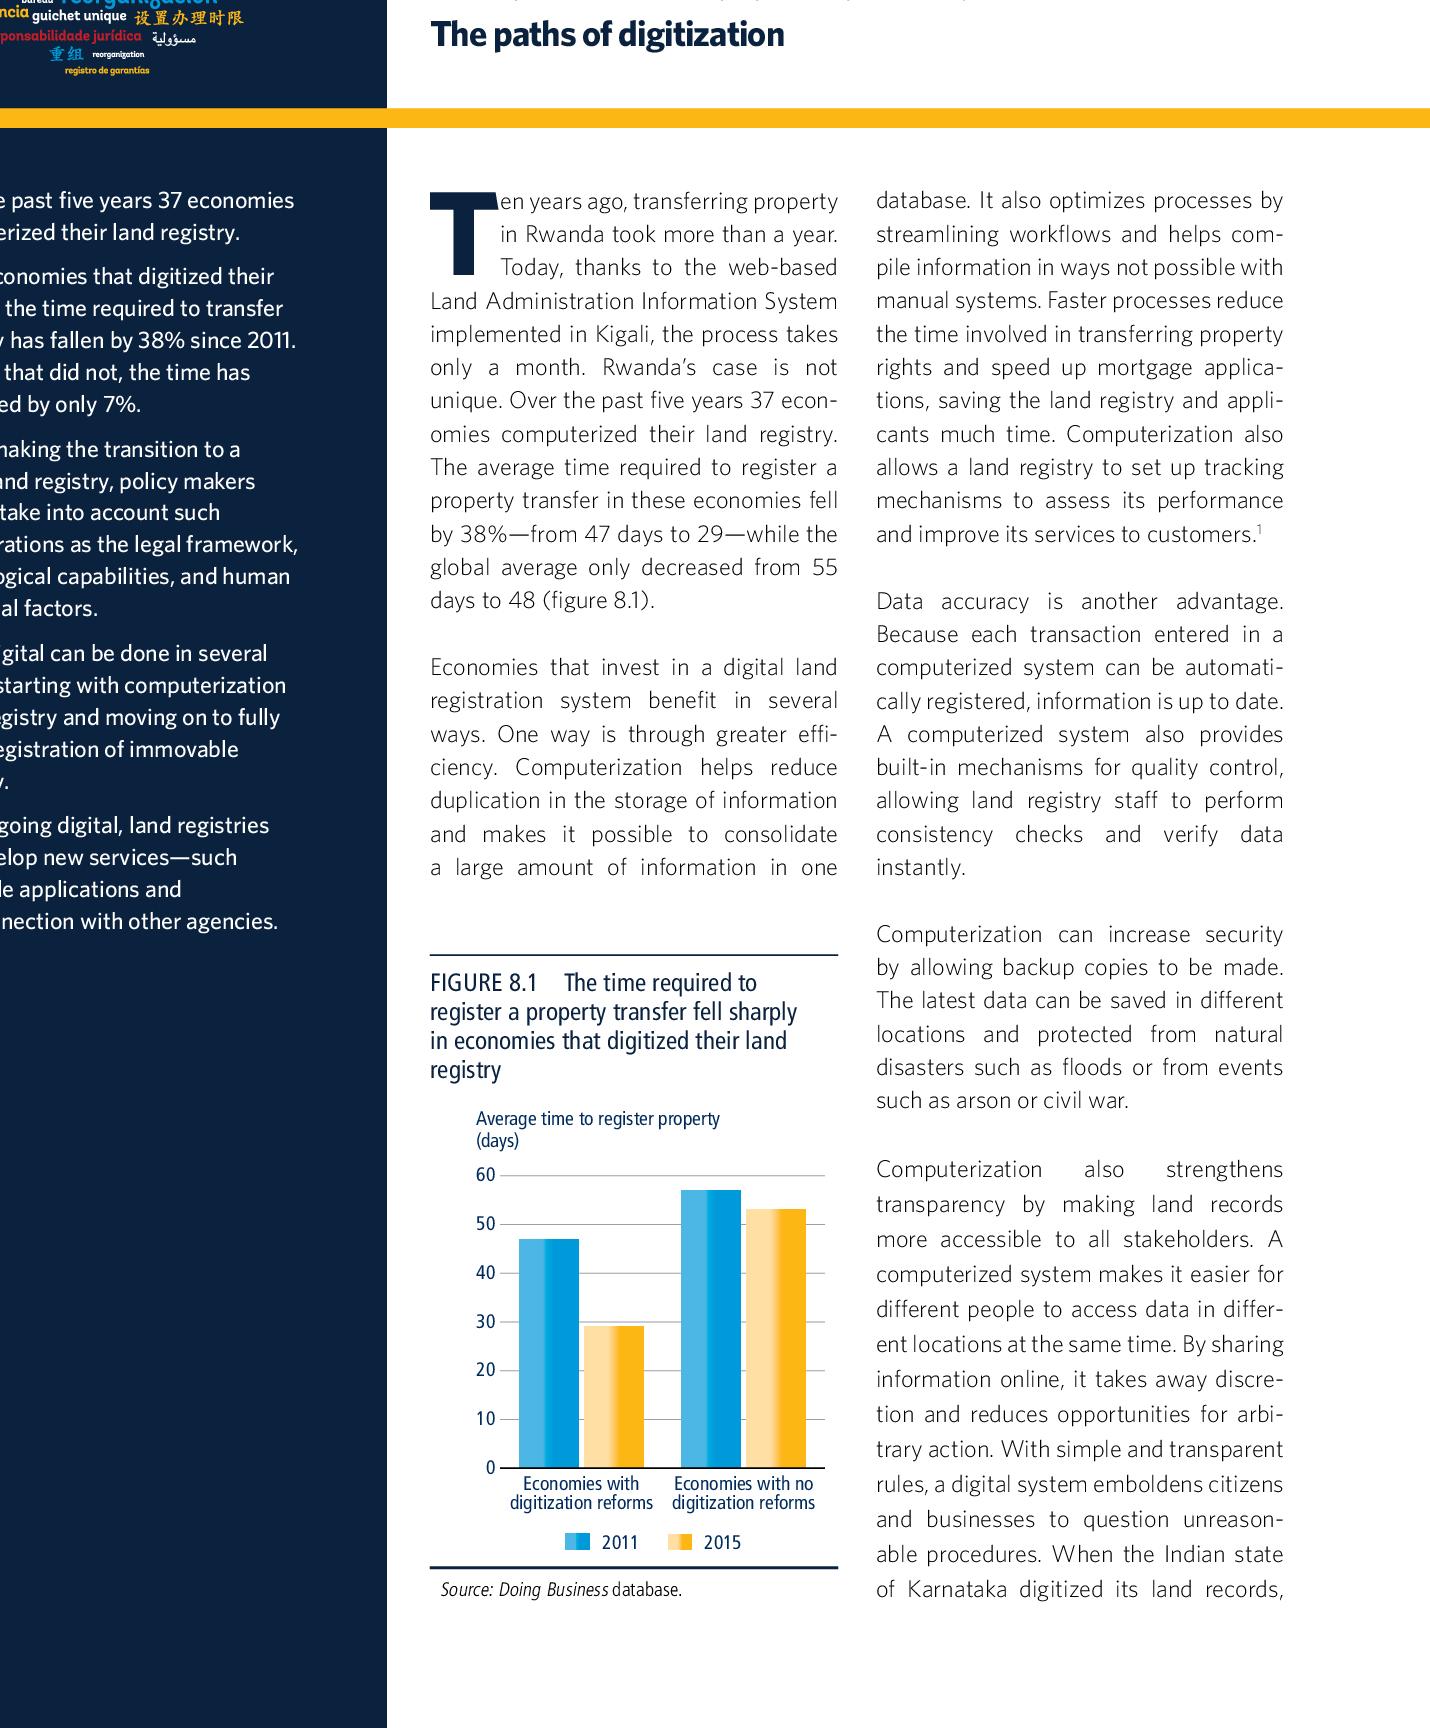 PDF] Doing Business 2016 Measuring Regulatory Quality and ...